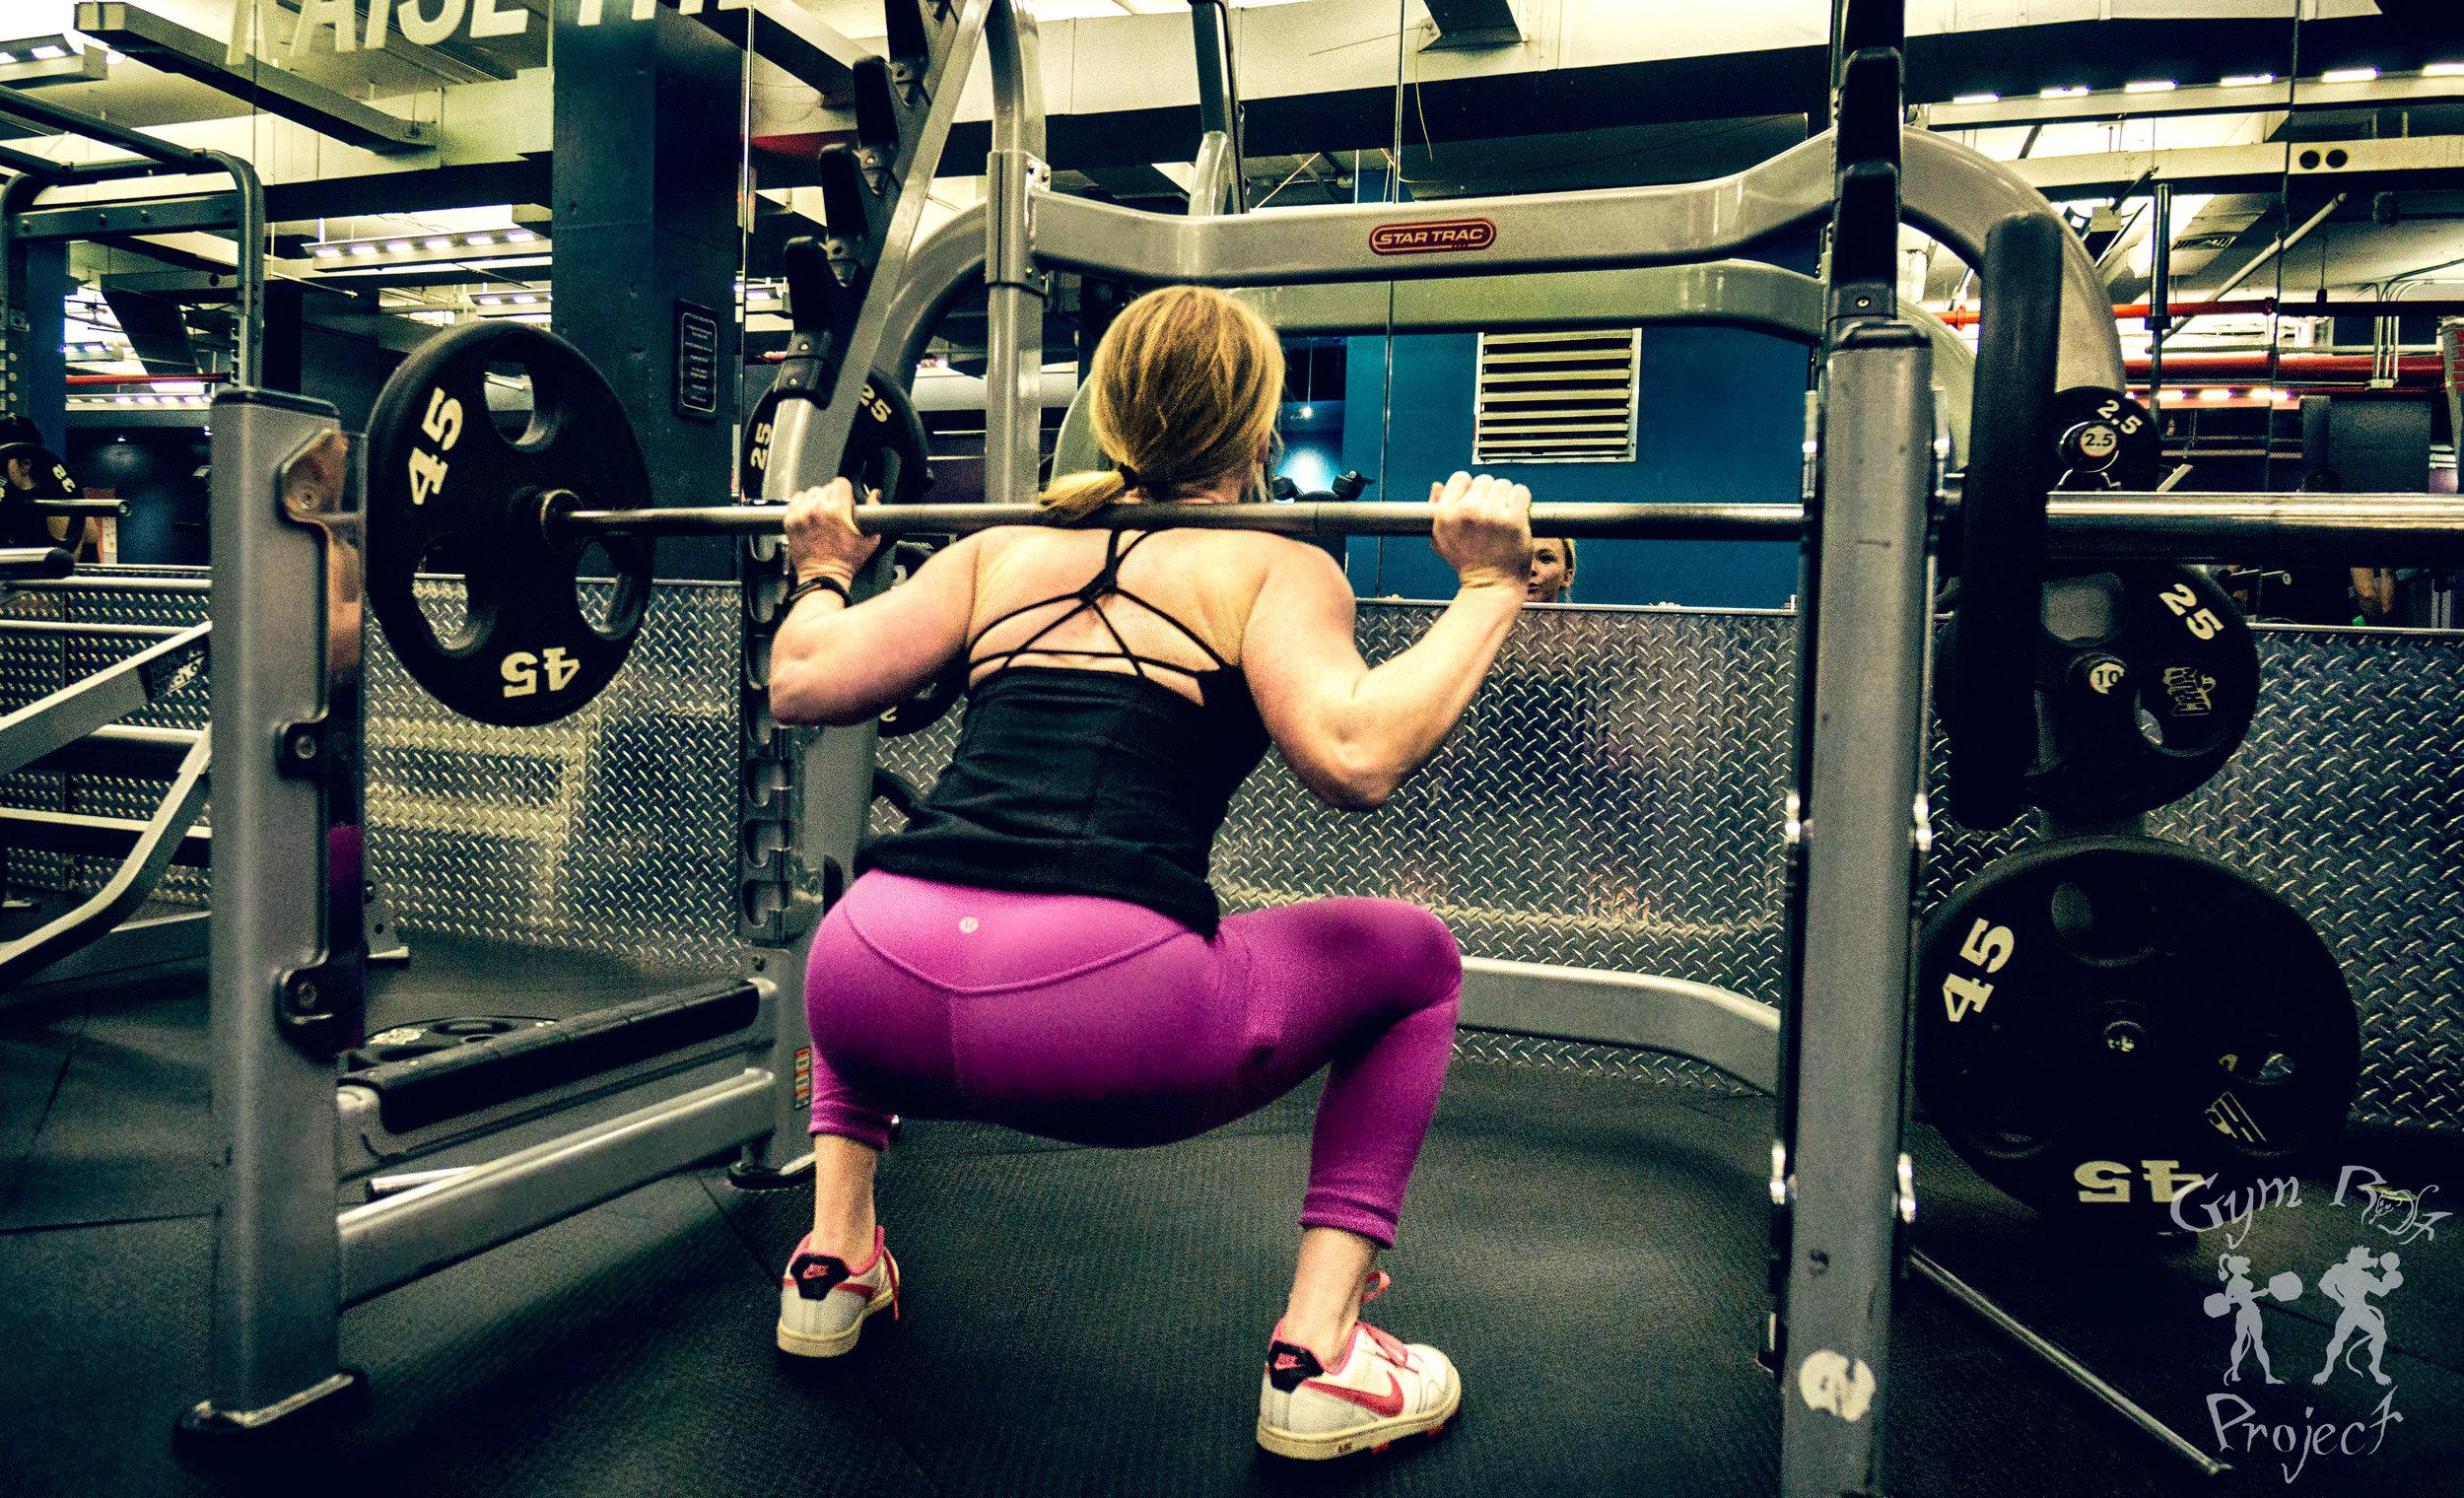 gym-rat-project-vickygood-photography9.jpg